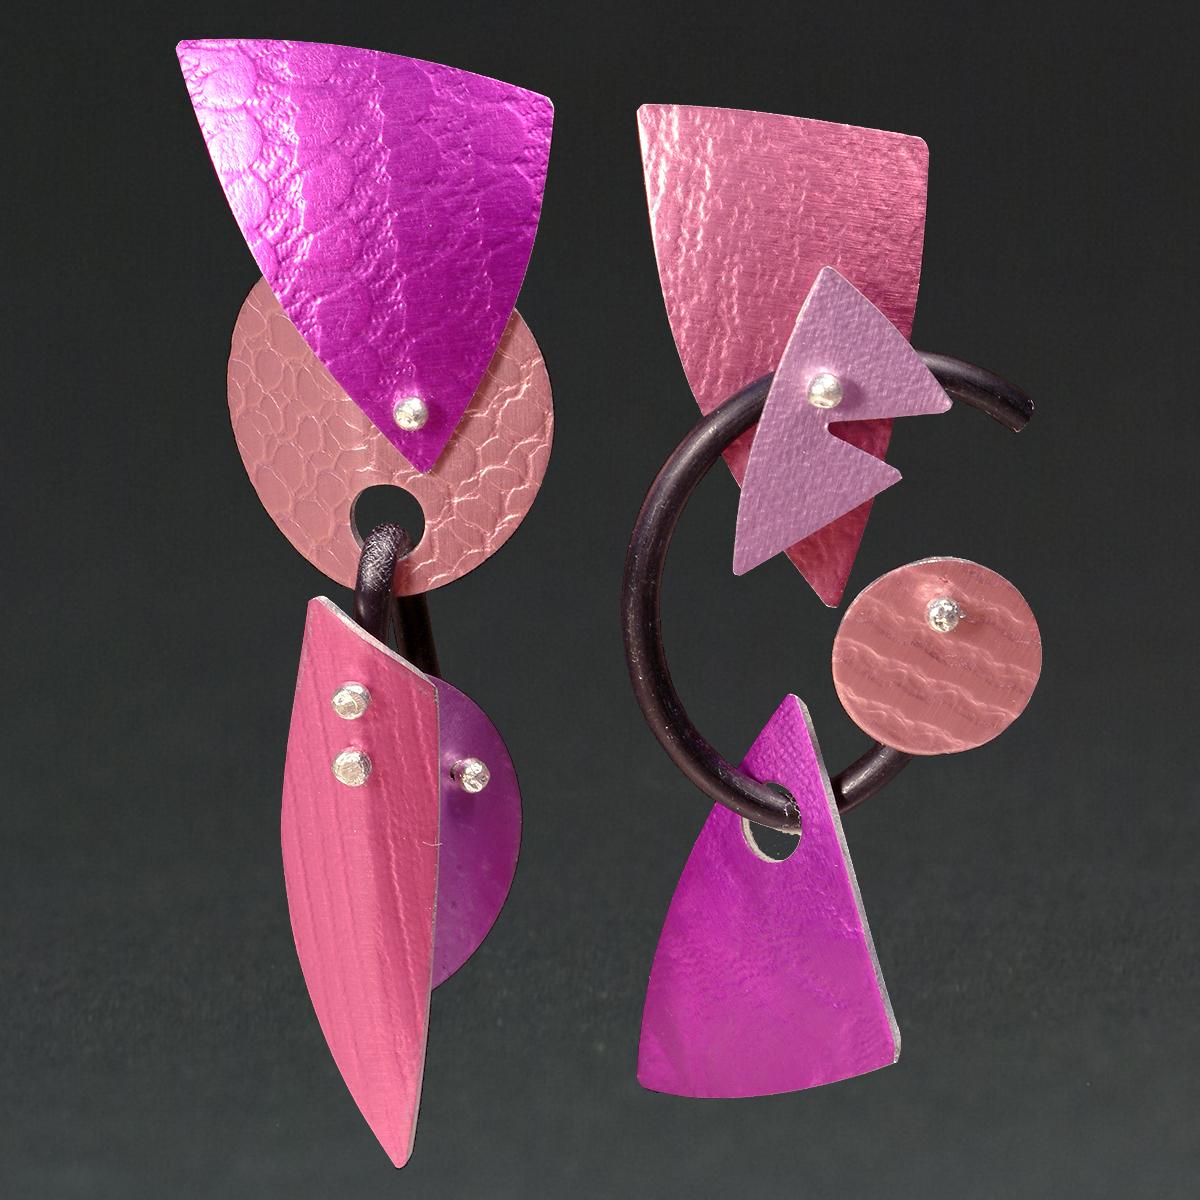 D - Violet, Berry, Fuchsia, Pink